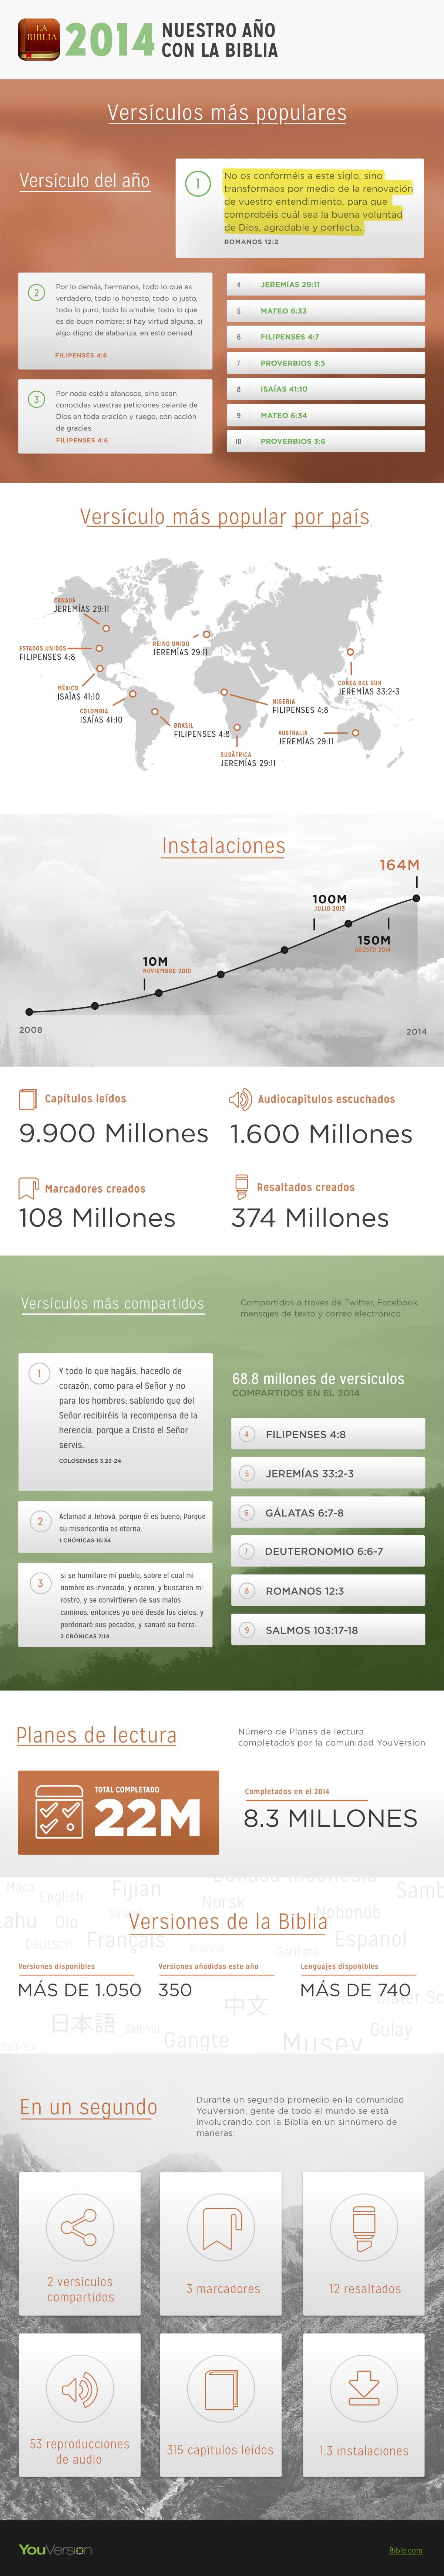 2014-Infographic-Spanish